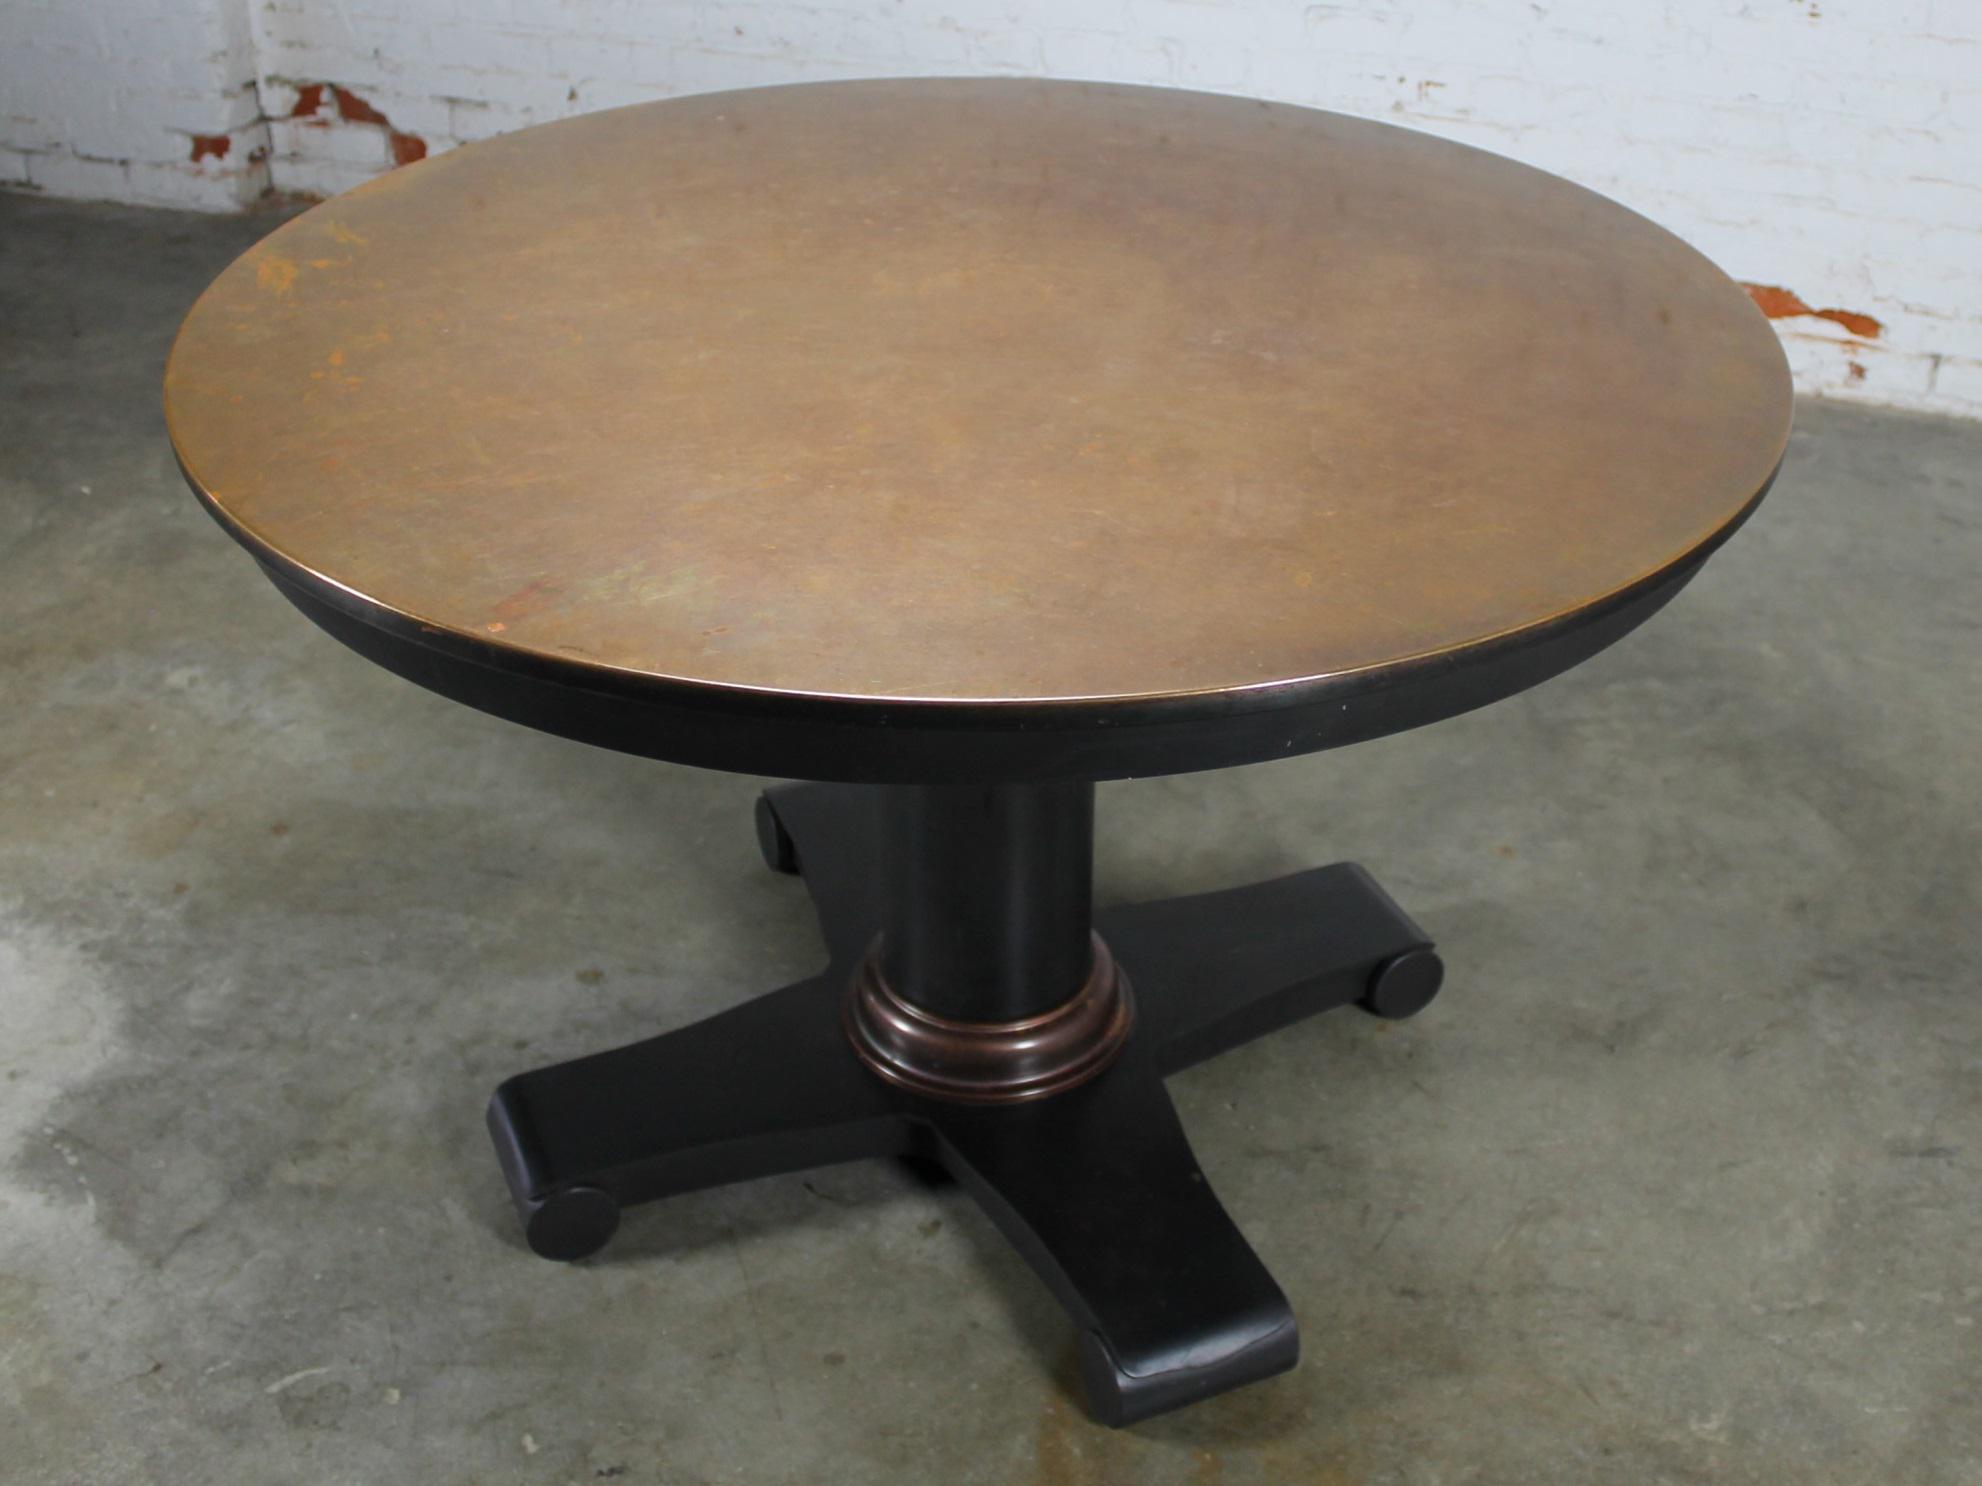 Contemporary Round Copper Top Dining Table Chairish : 5d49c4e3 ba69 47e9 8a2e 85c3e656553easpectfitampwidth640ampheight640 from www.chairish.com size 640 x 640 jpeg 32kB